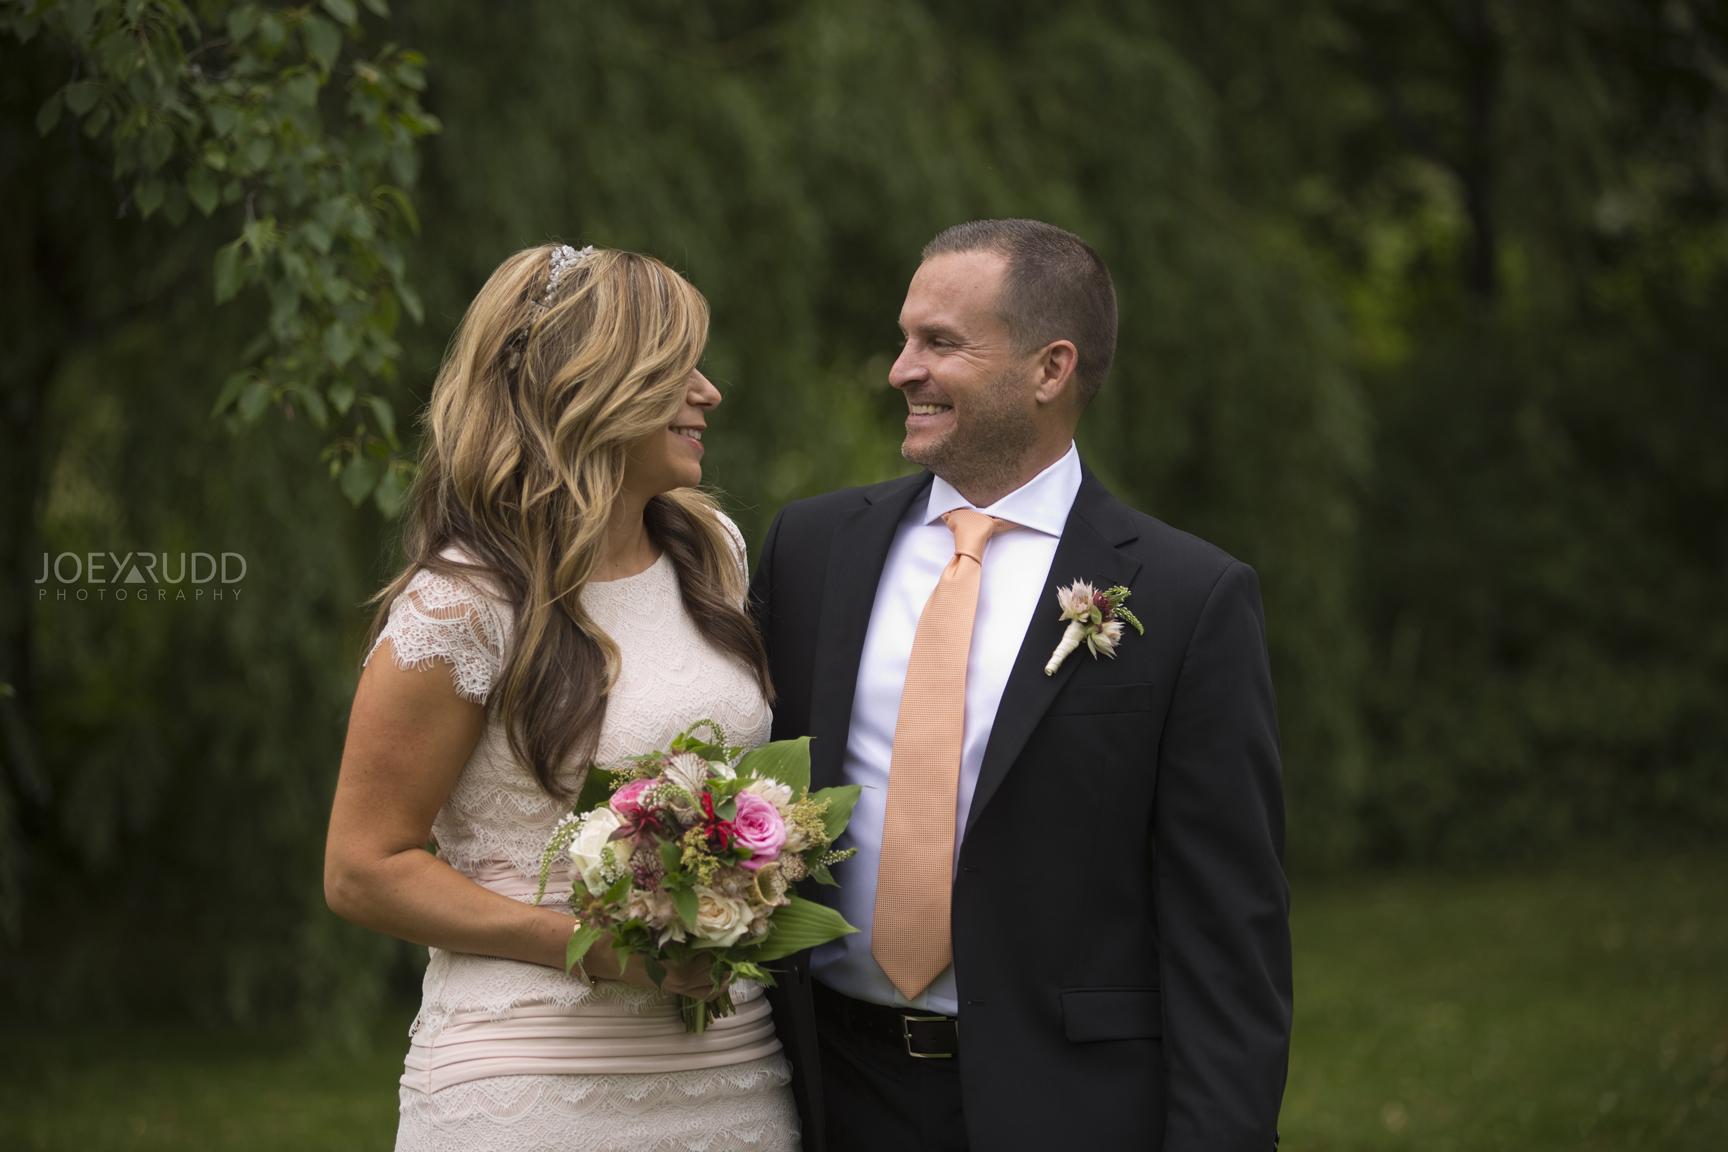 Elopement Wedding by Ottawa Wedding Photographer Joey Rudd Photography Arboretum Ceremony